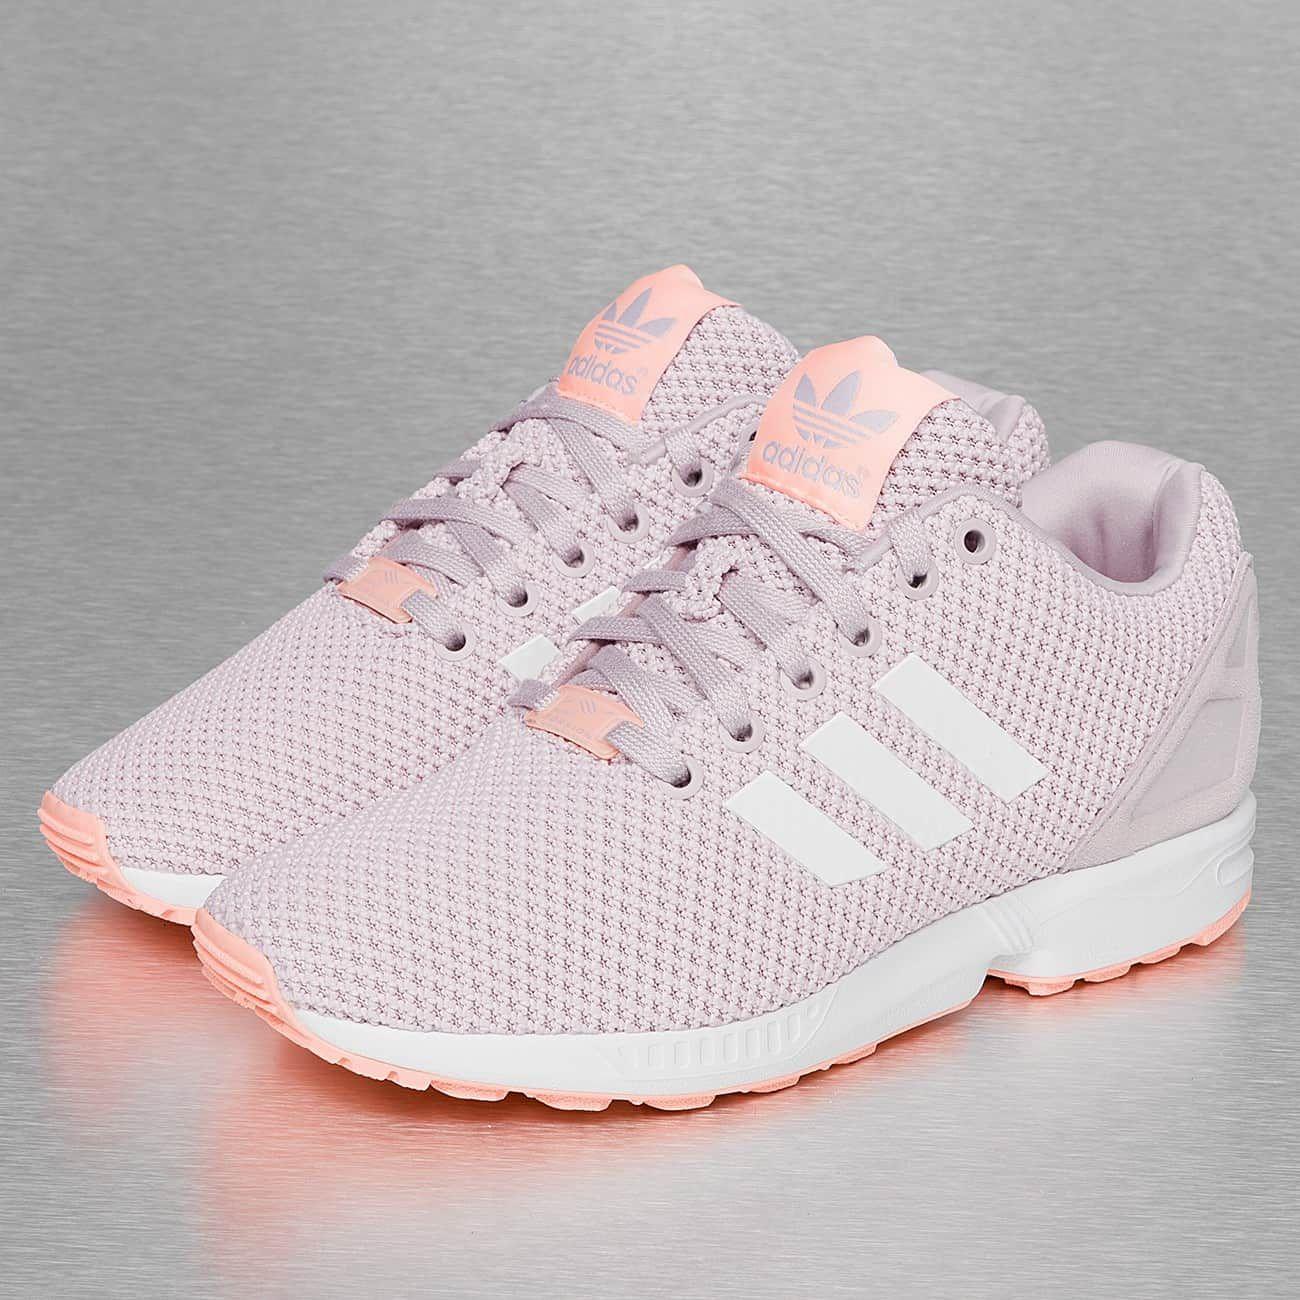 Bequeme Adidas Schuhe